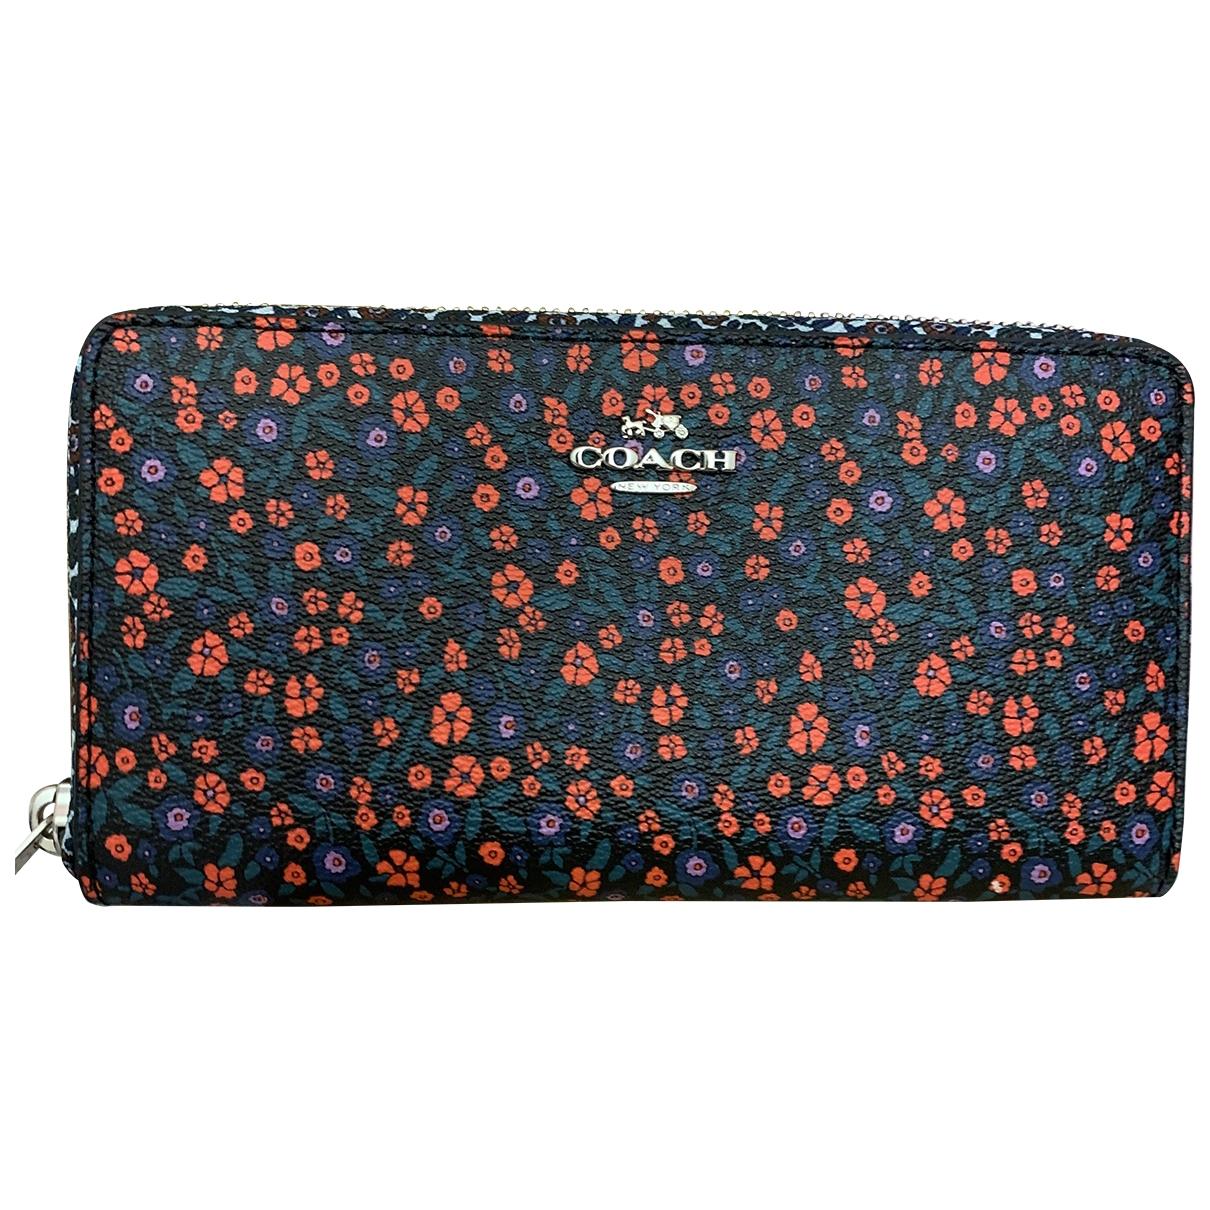 Coach \N Multicolour Leather wallet for Women \N